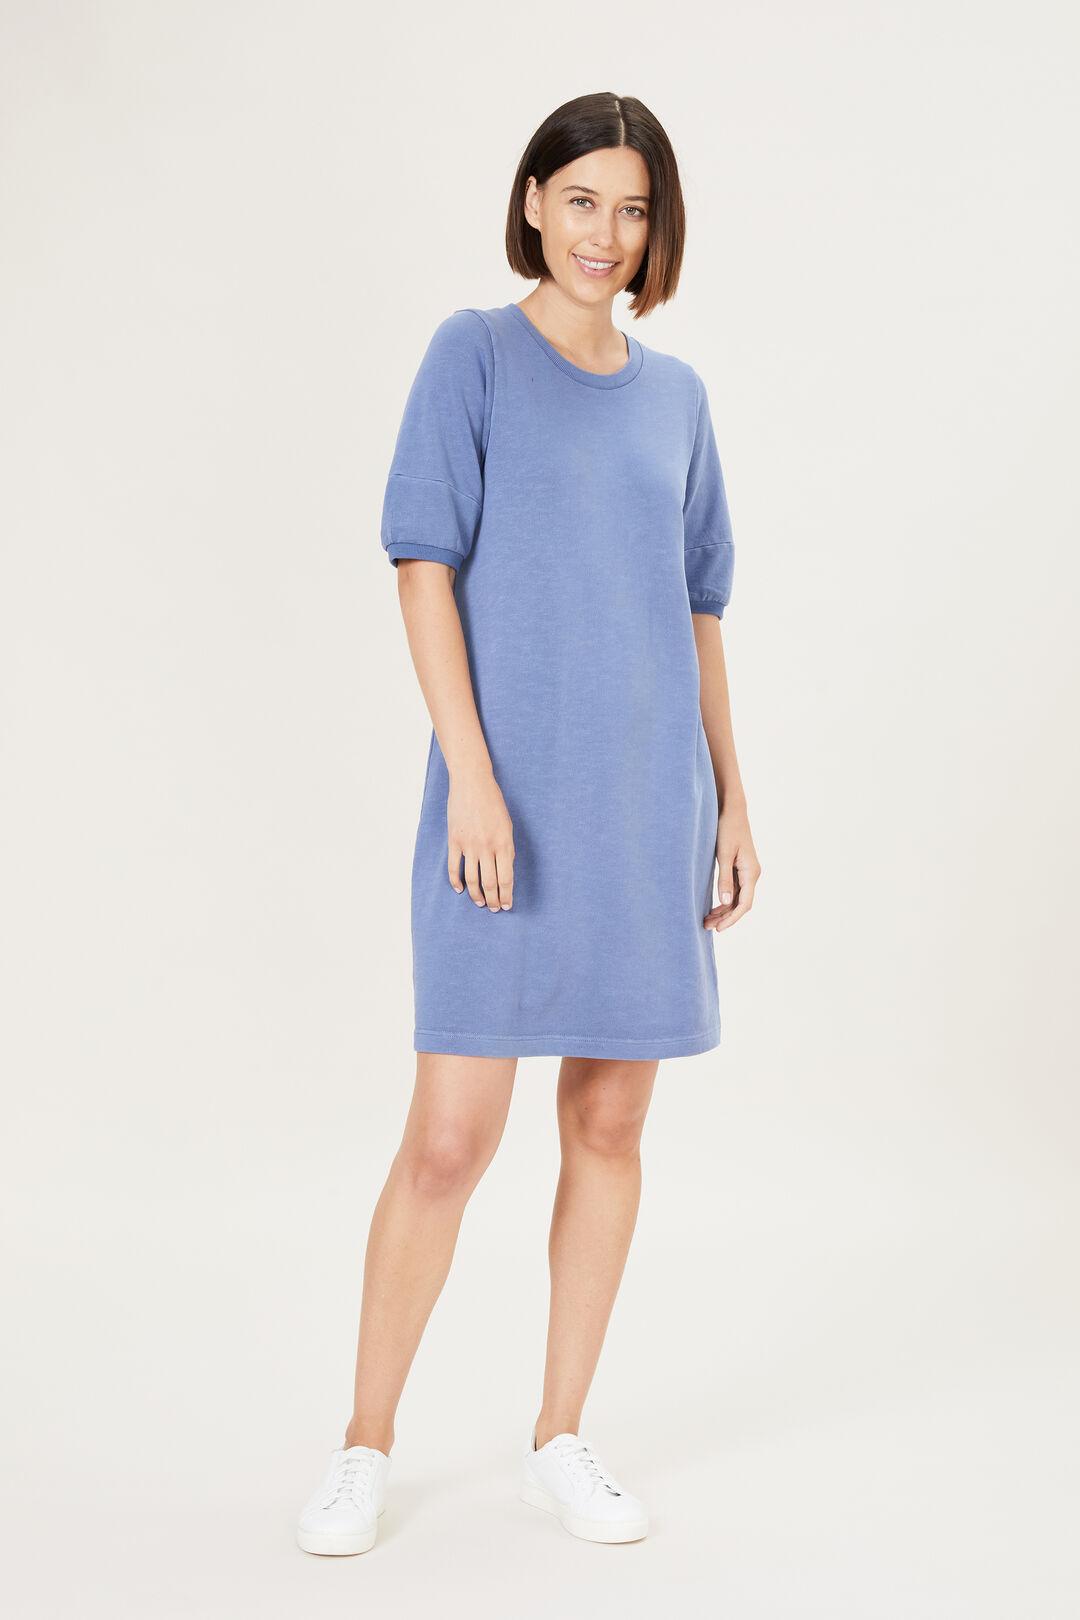 PUFF SLEEVE SWEAT DRESS  ACID SLATE BLUE  hi-res